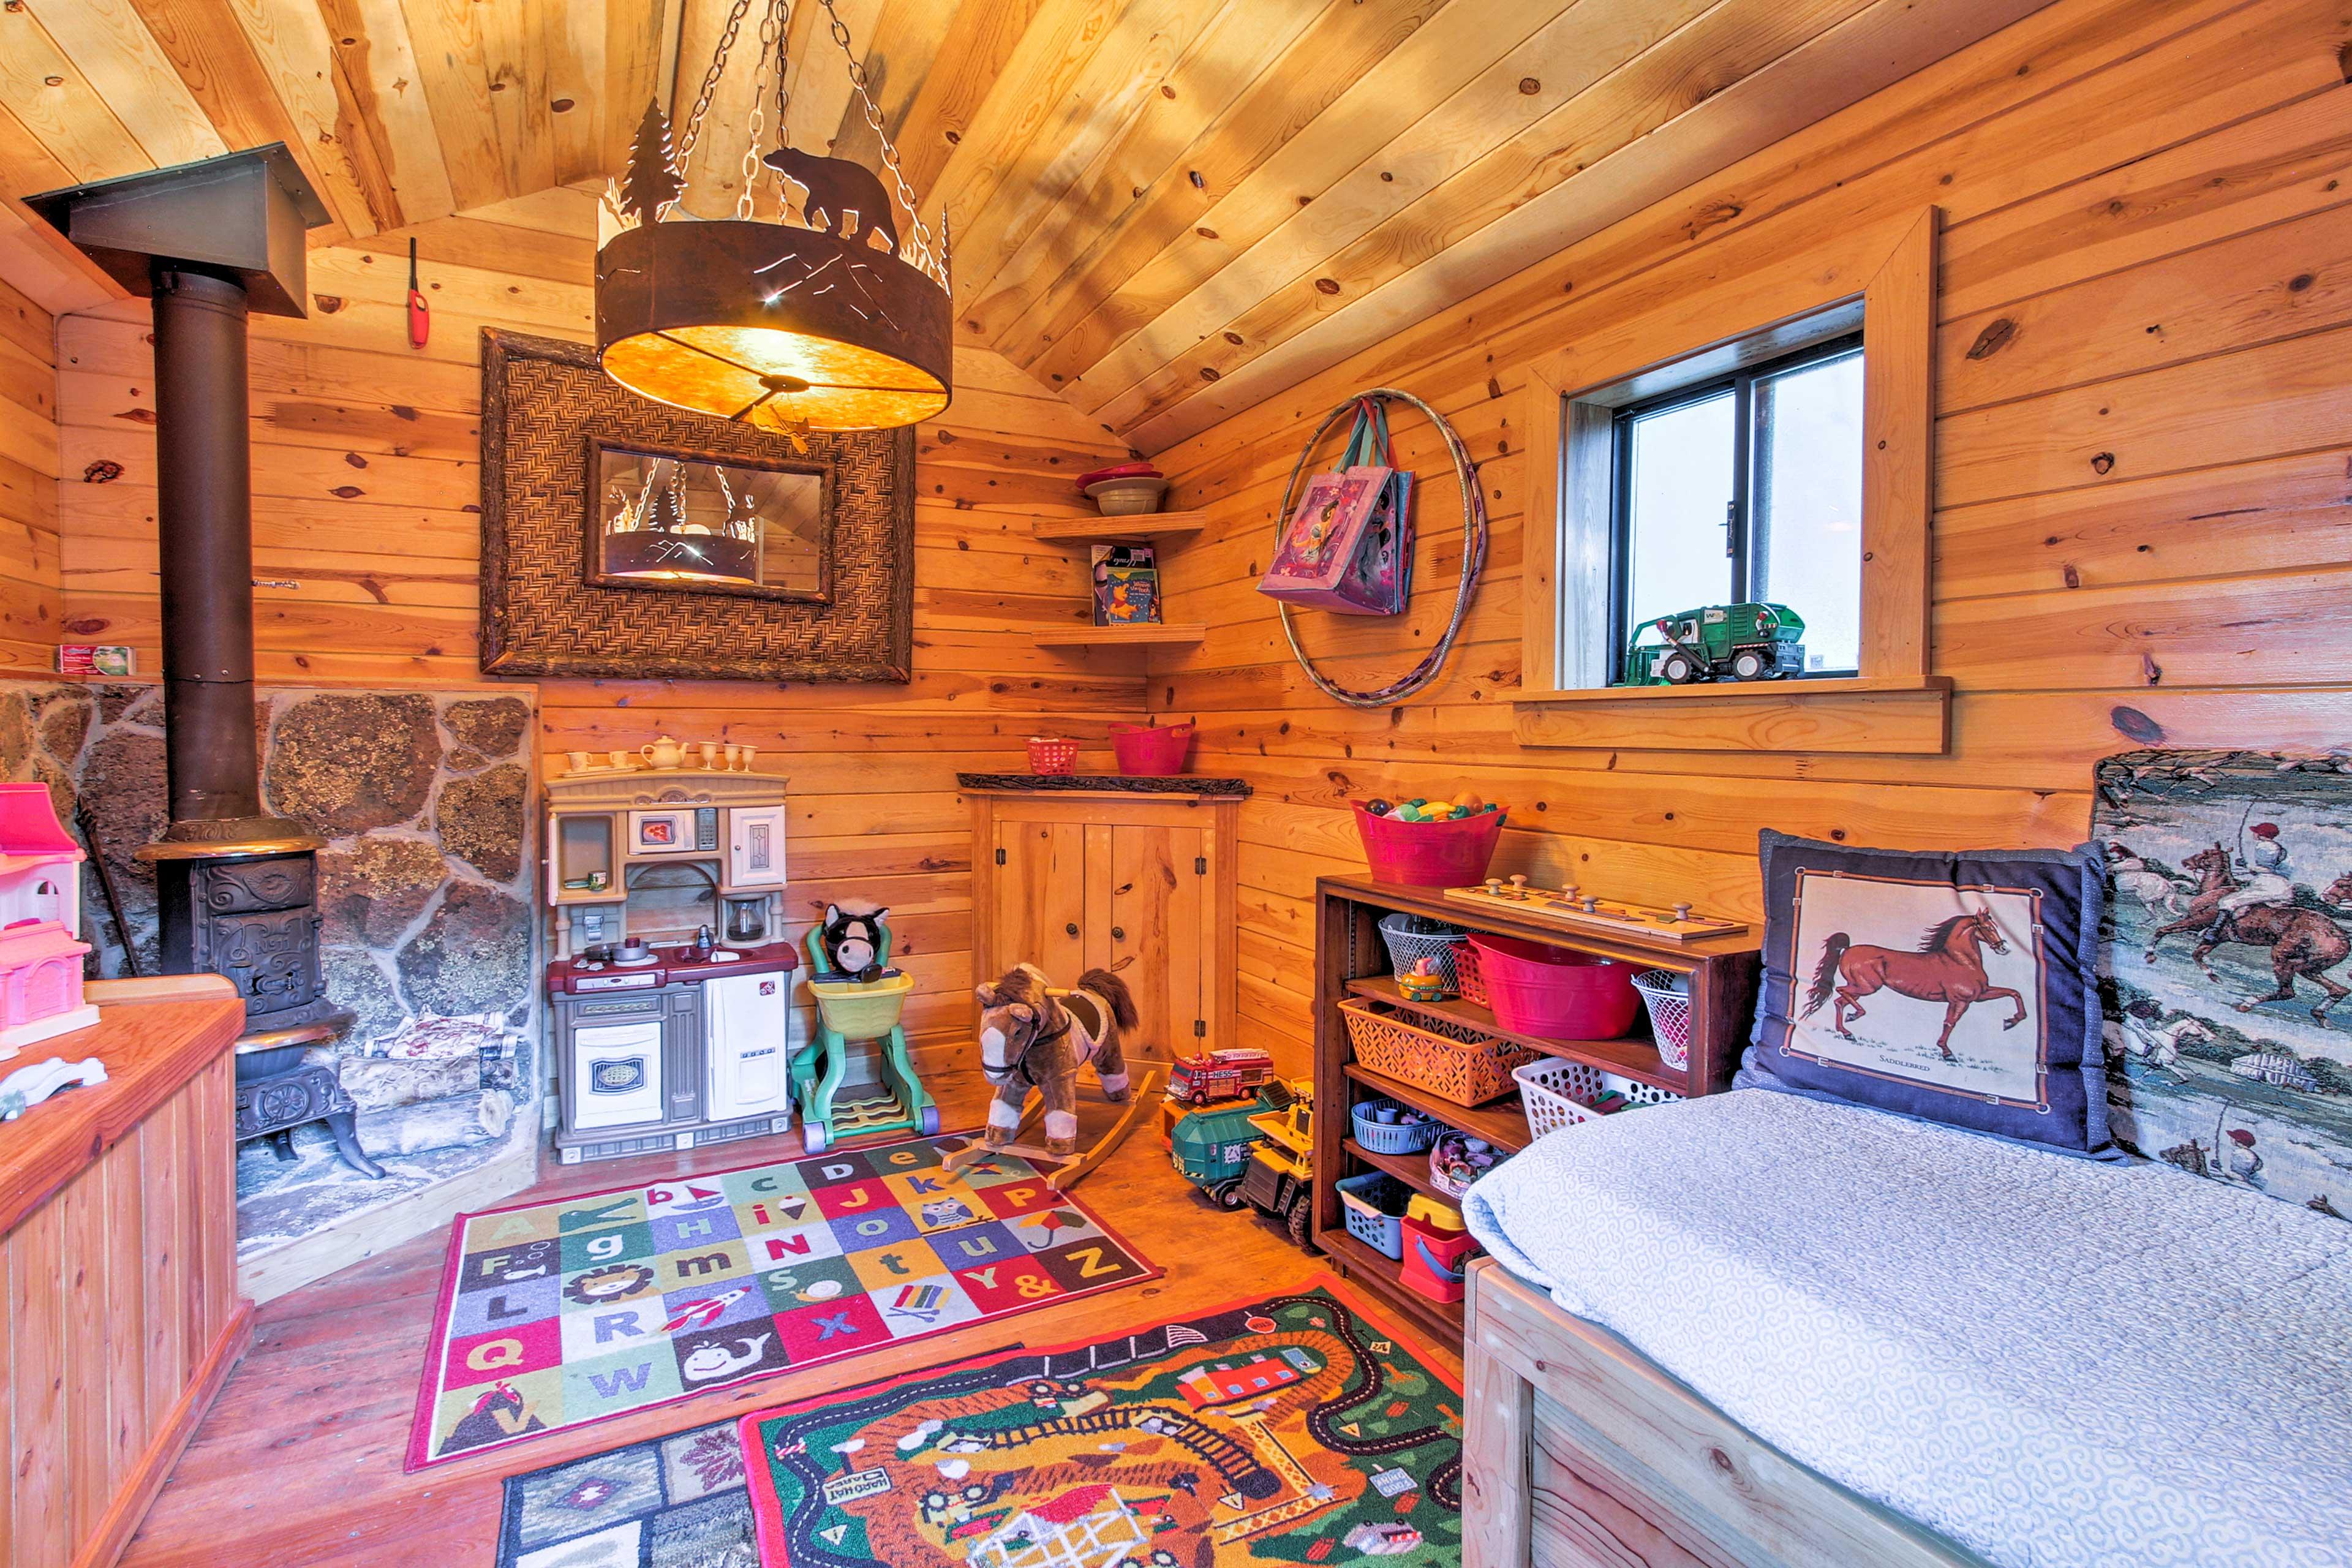 Shared Toy Cabin